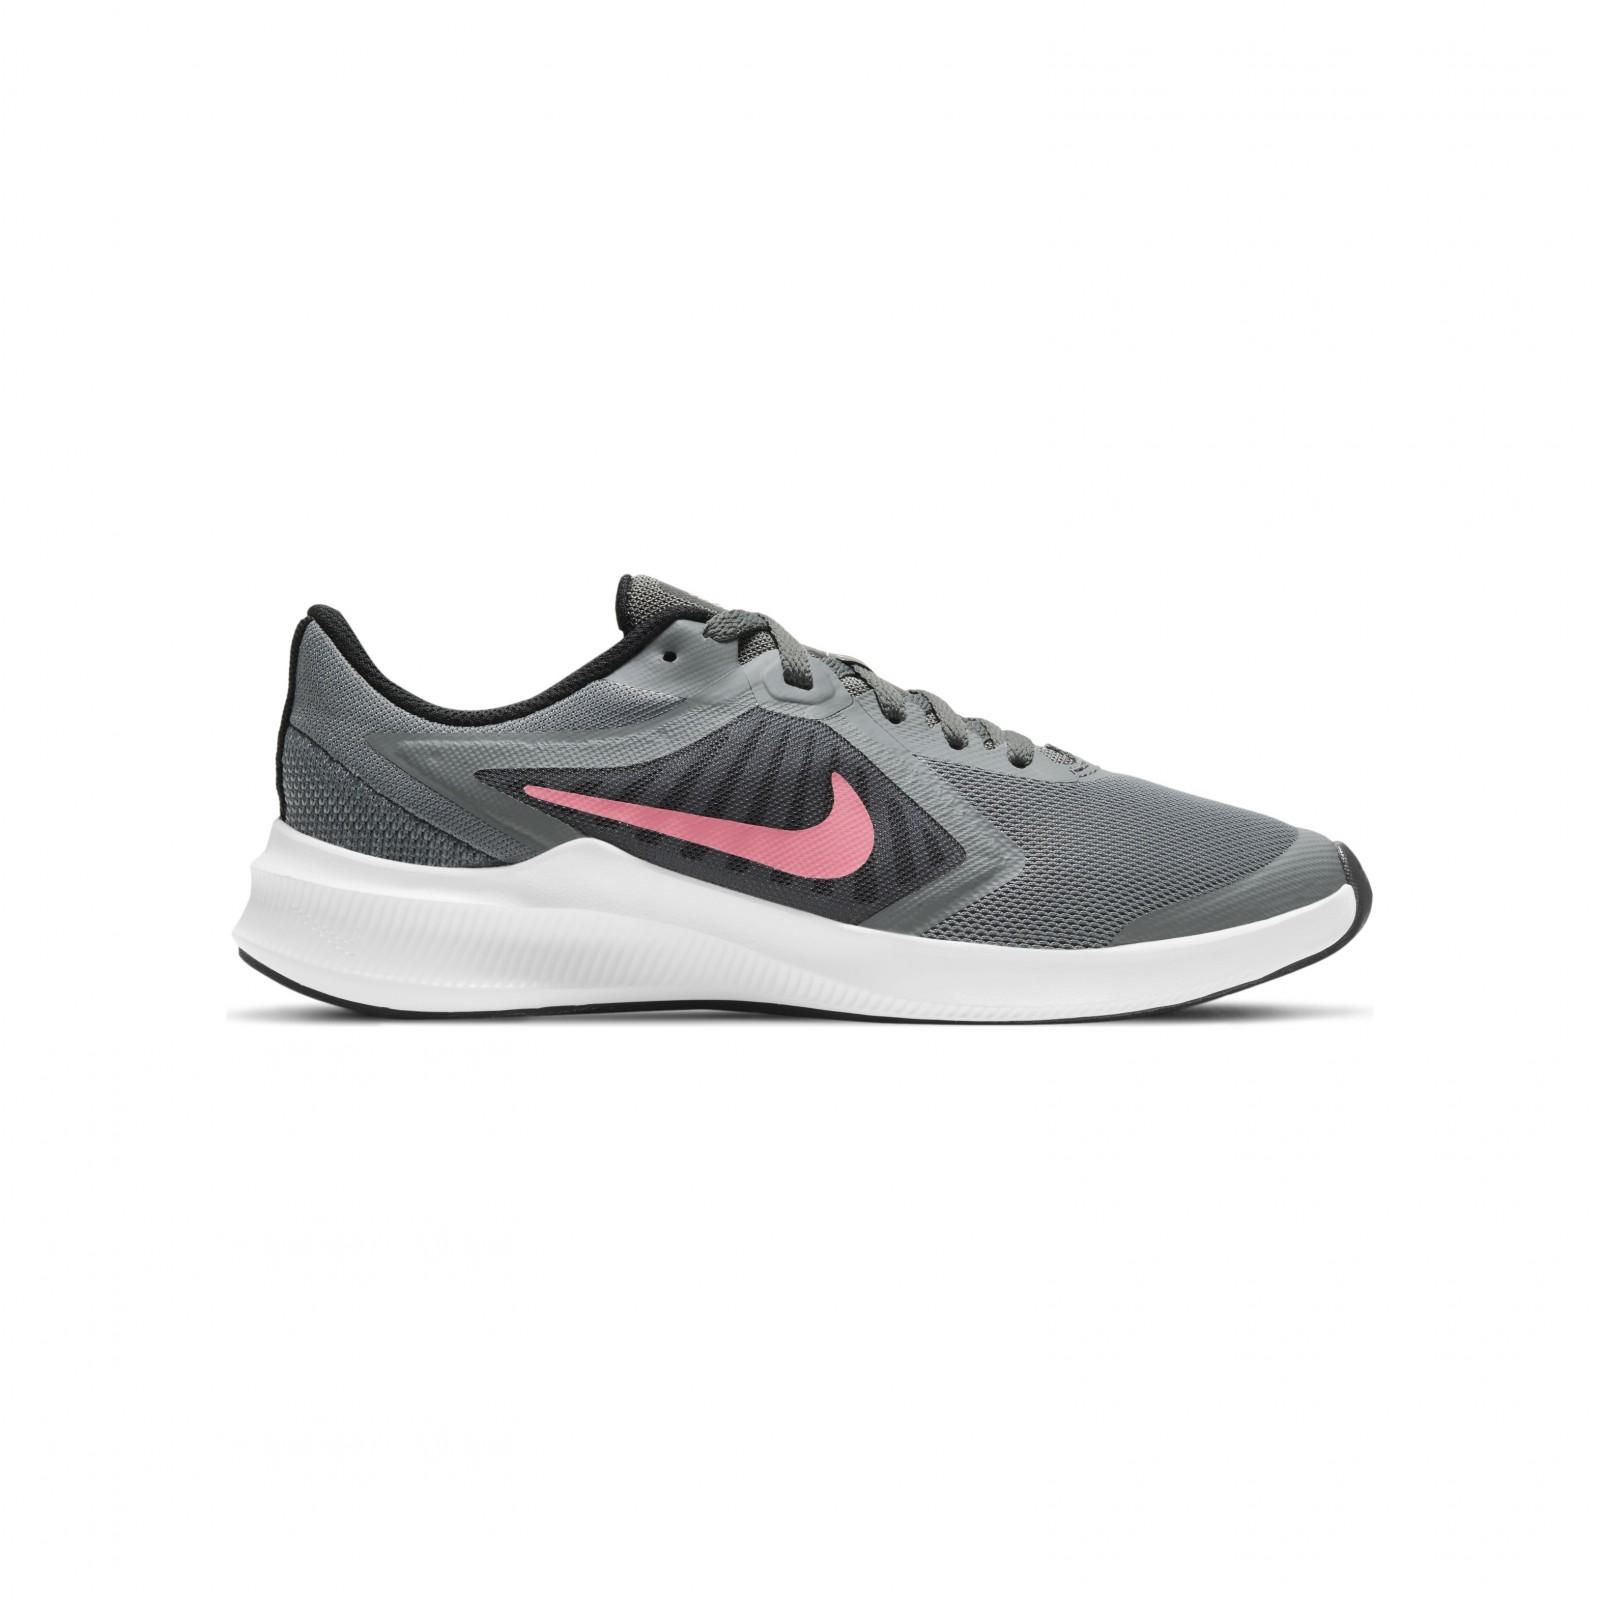 Nike Downshifter 10 SMOKE GREY/SUNSET PULSE-BLACK-WHITE